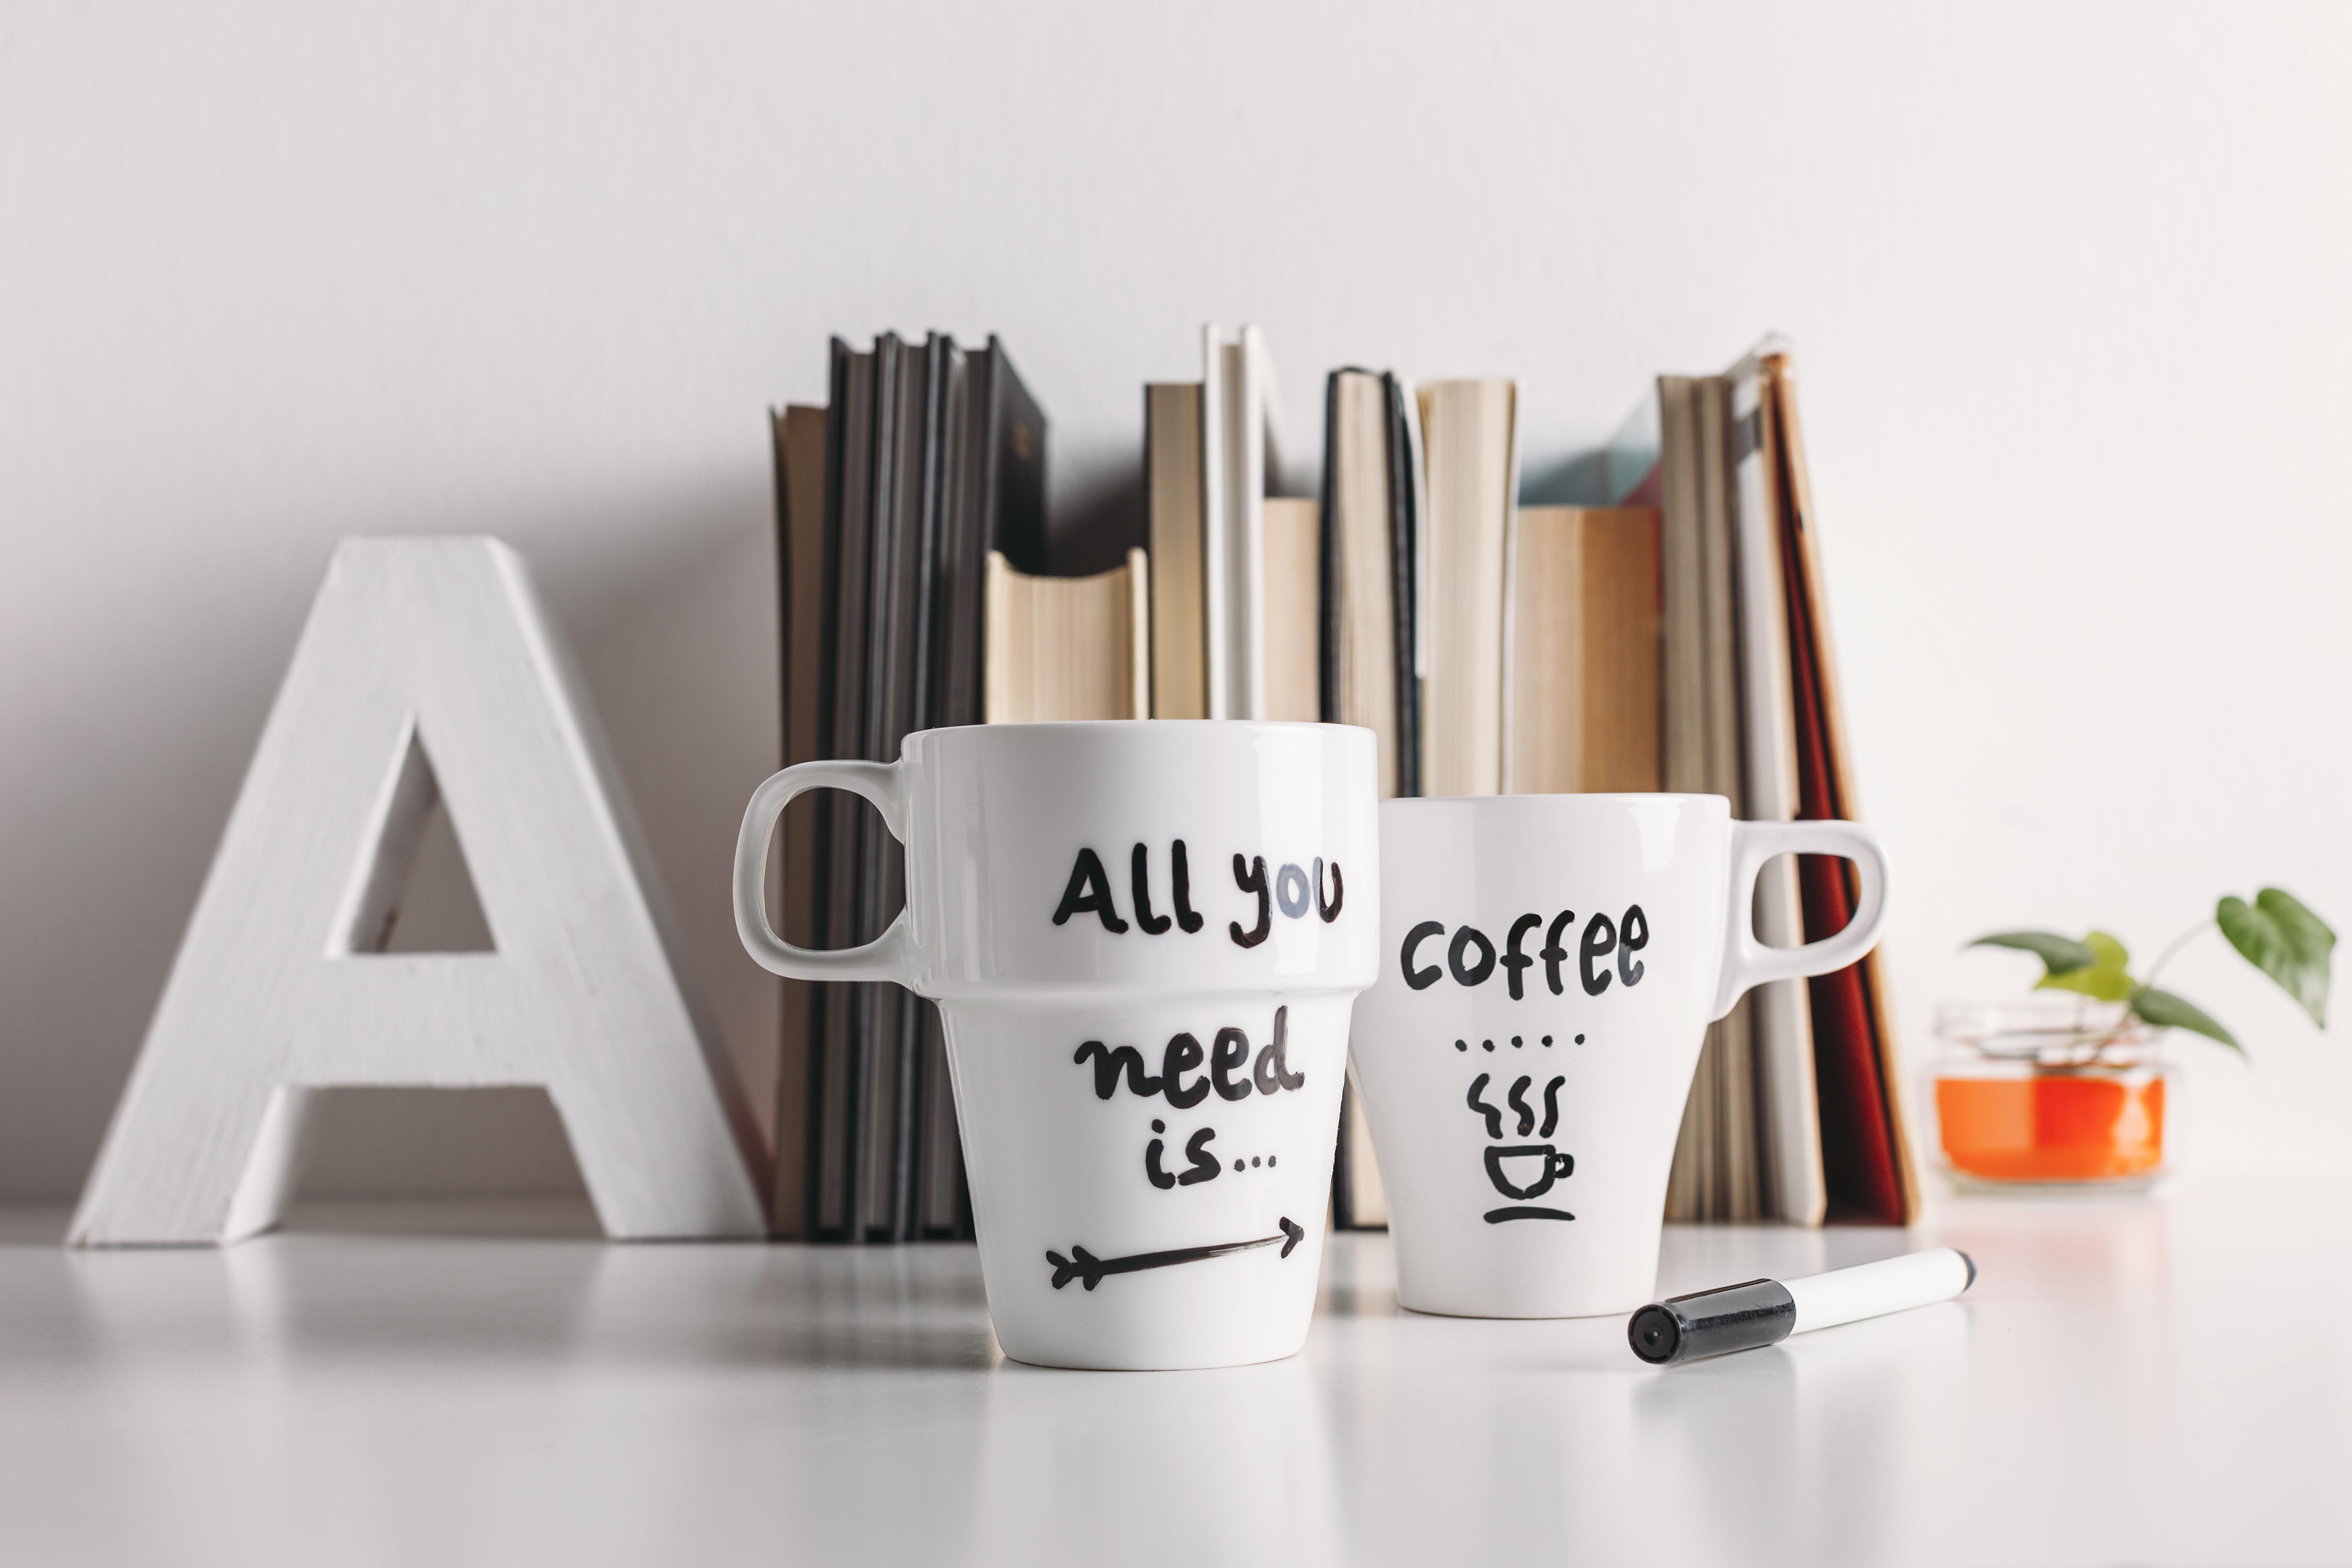 Drick kaffe - lev längre